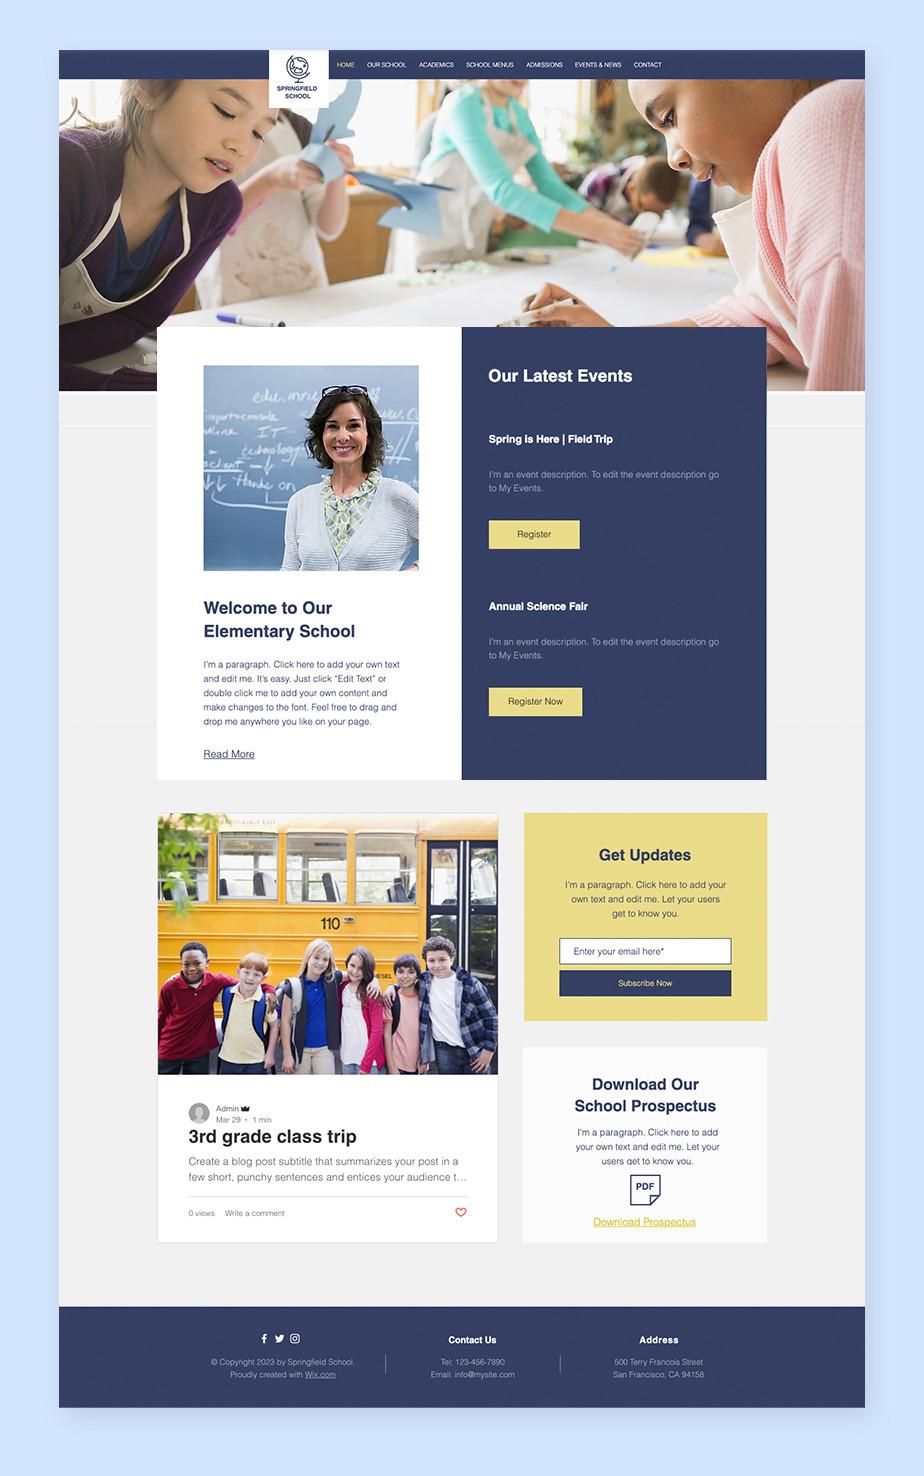 Teaching online: School website